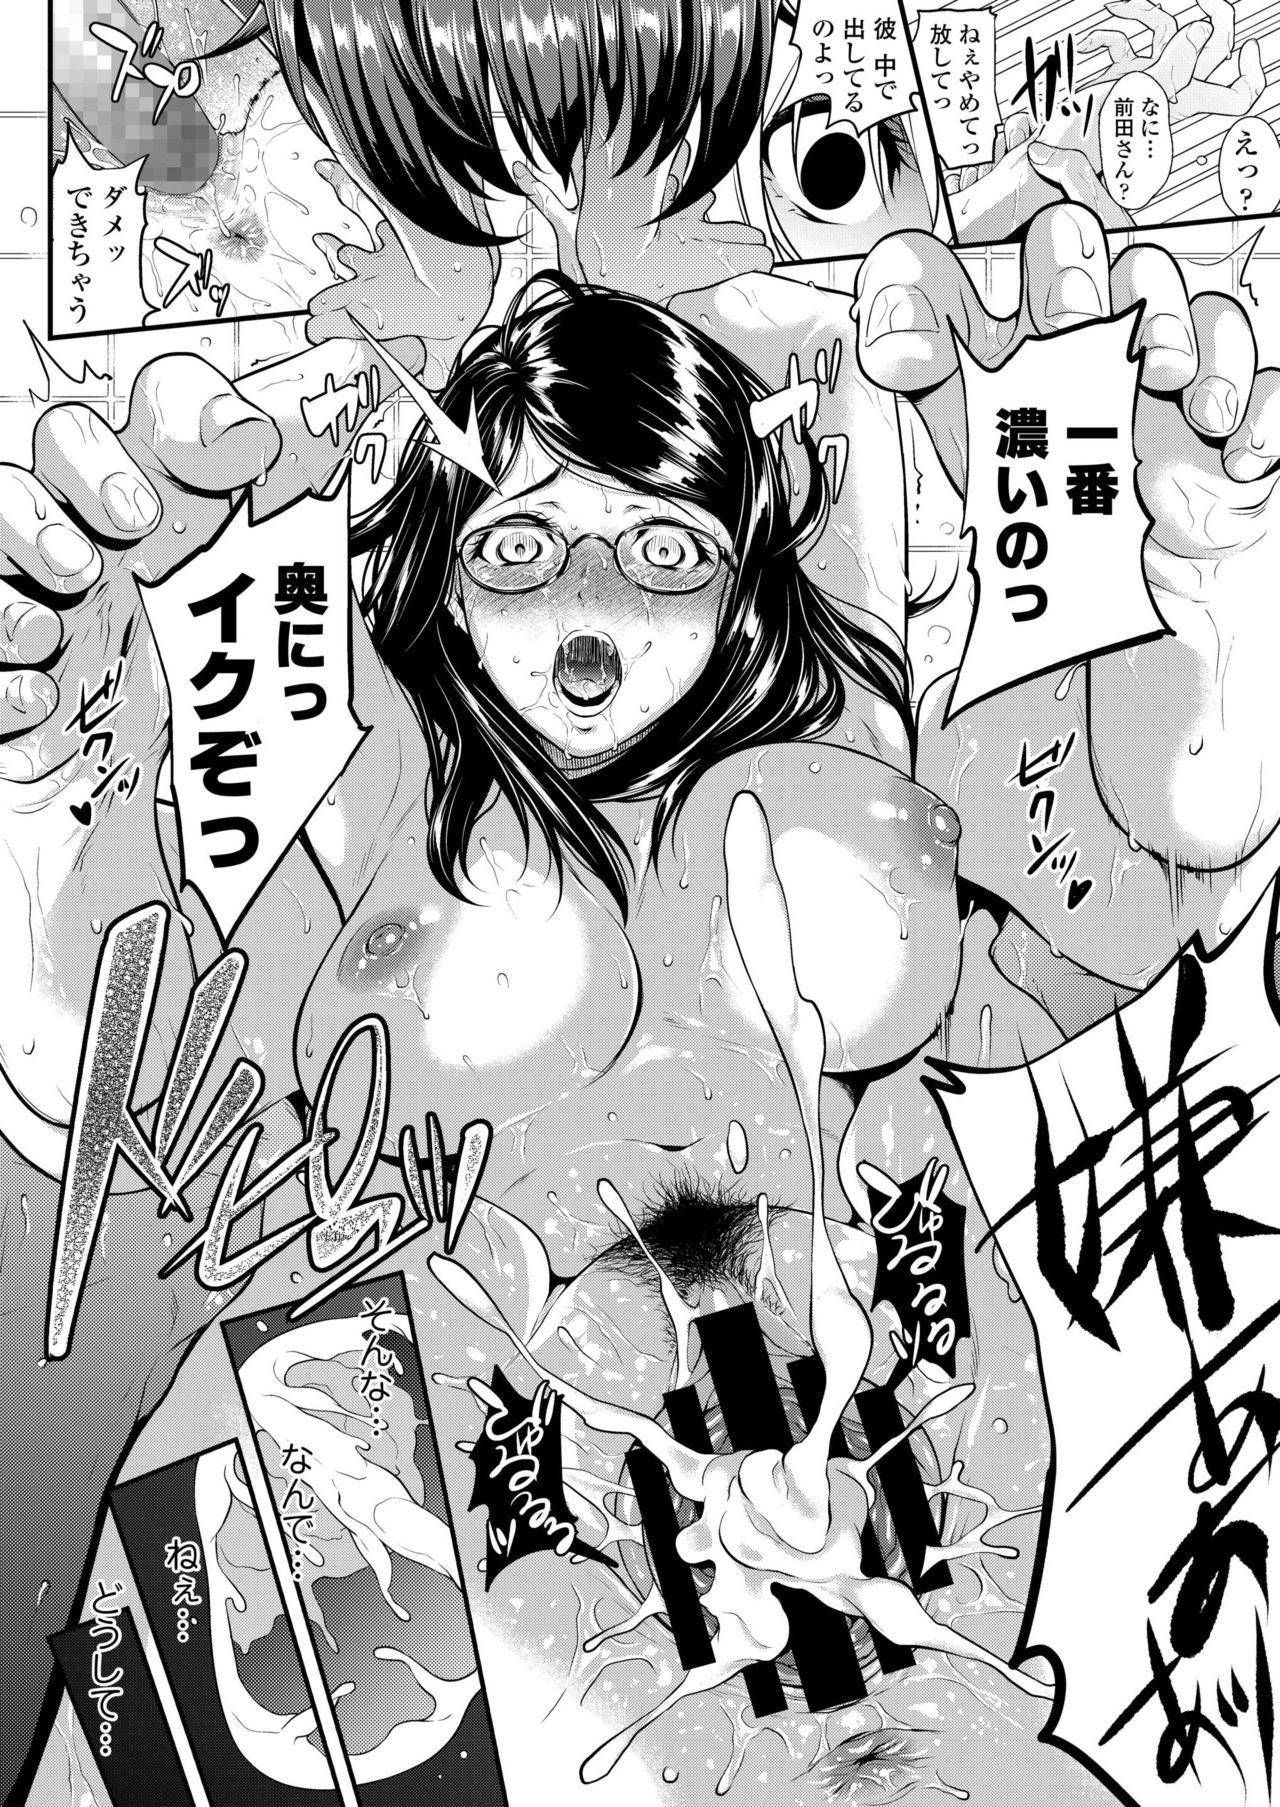 COMIC AOHA 2019 Haru 177